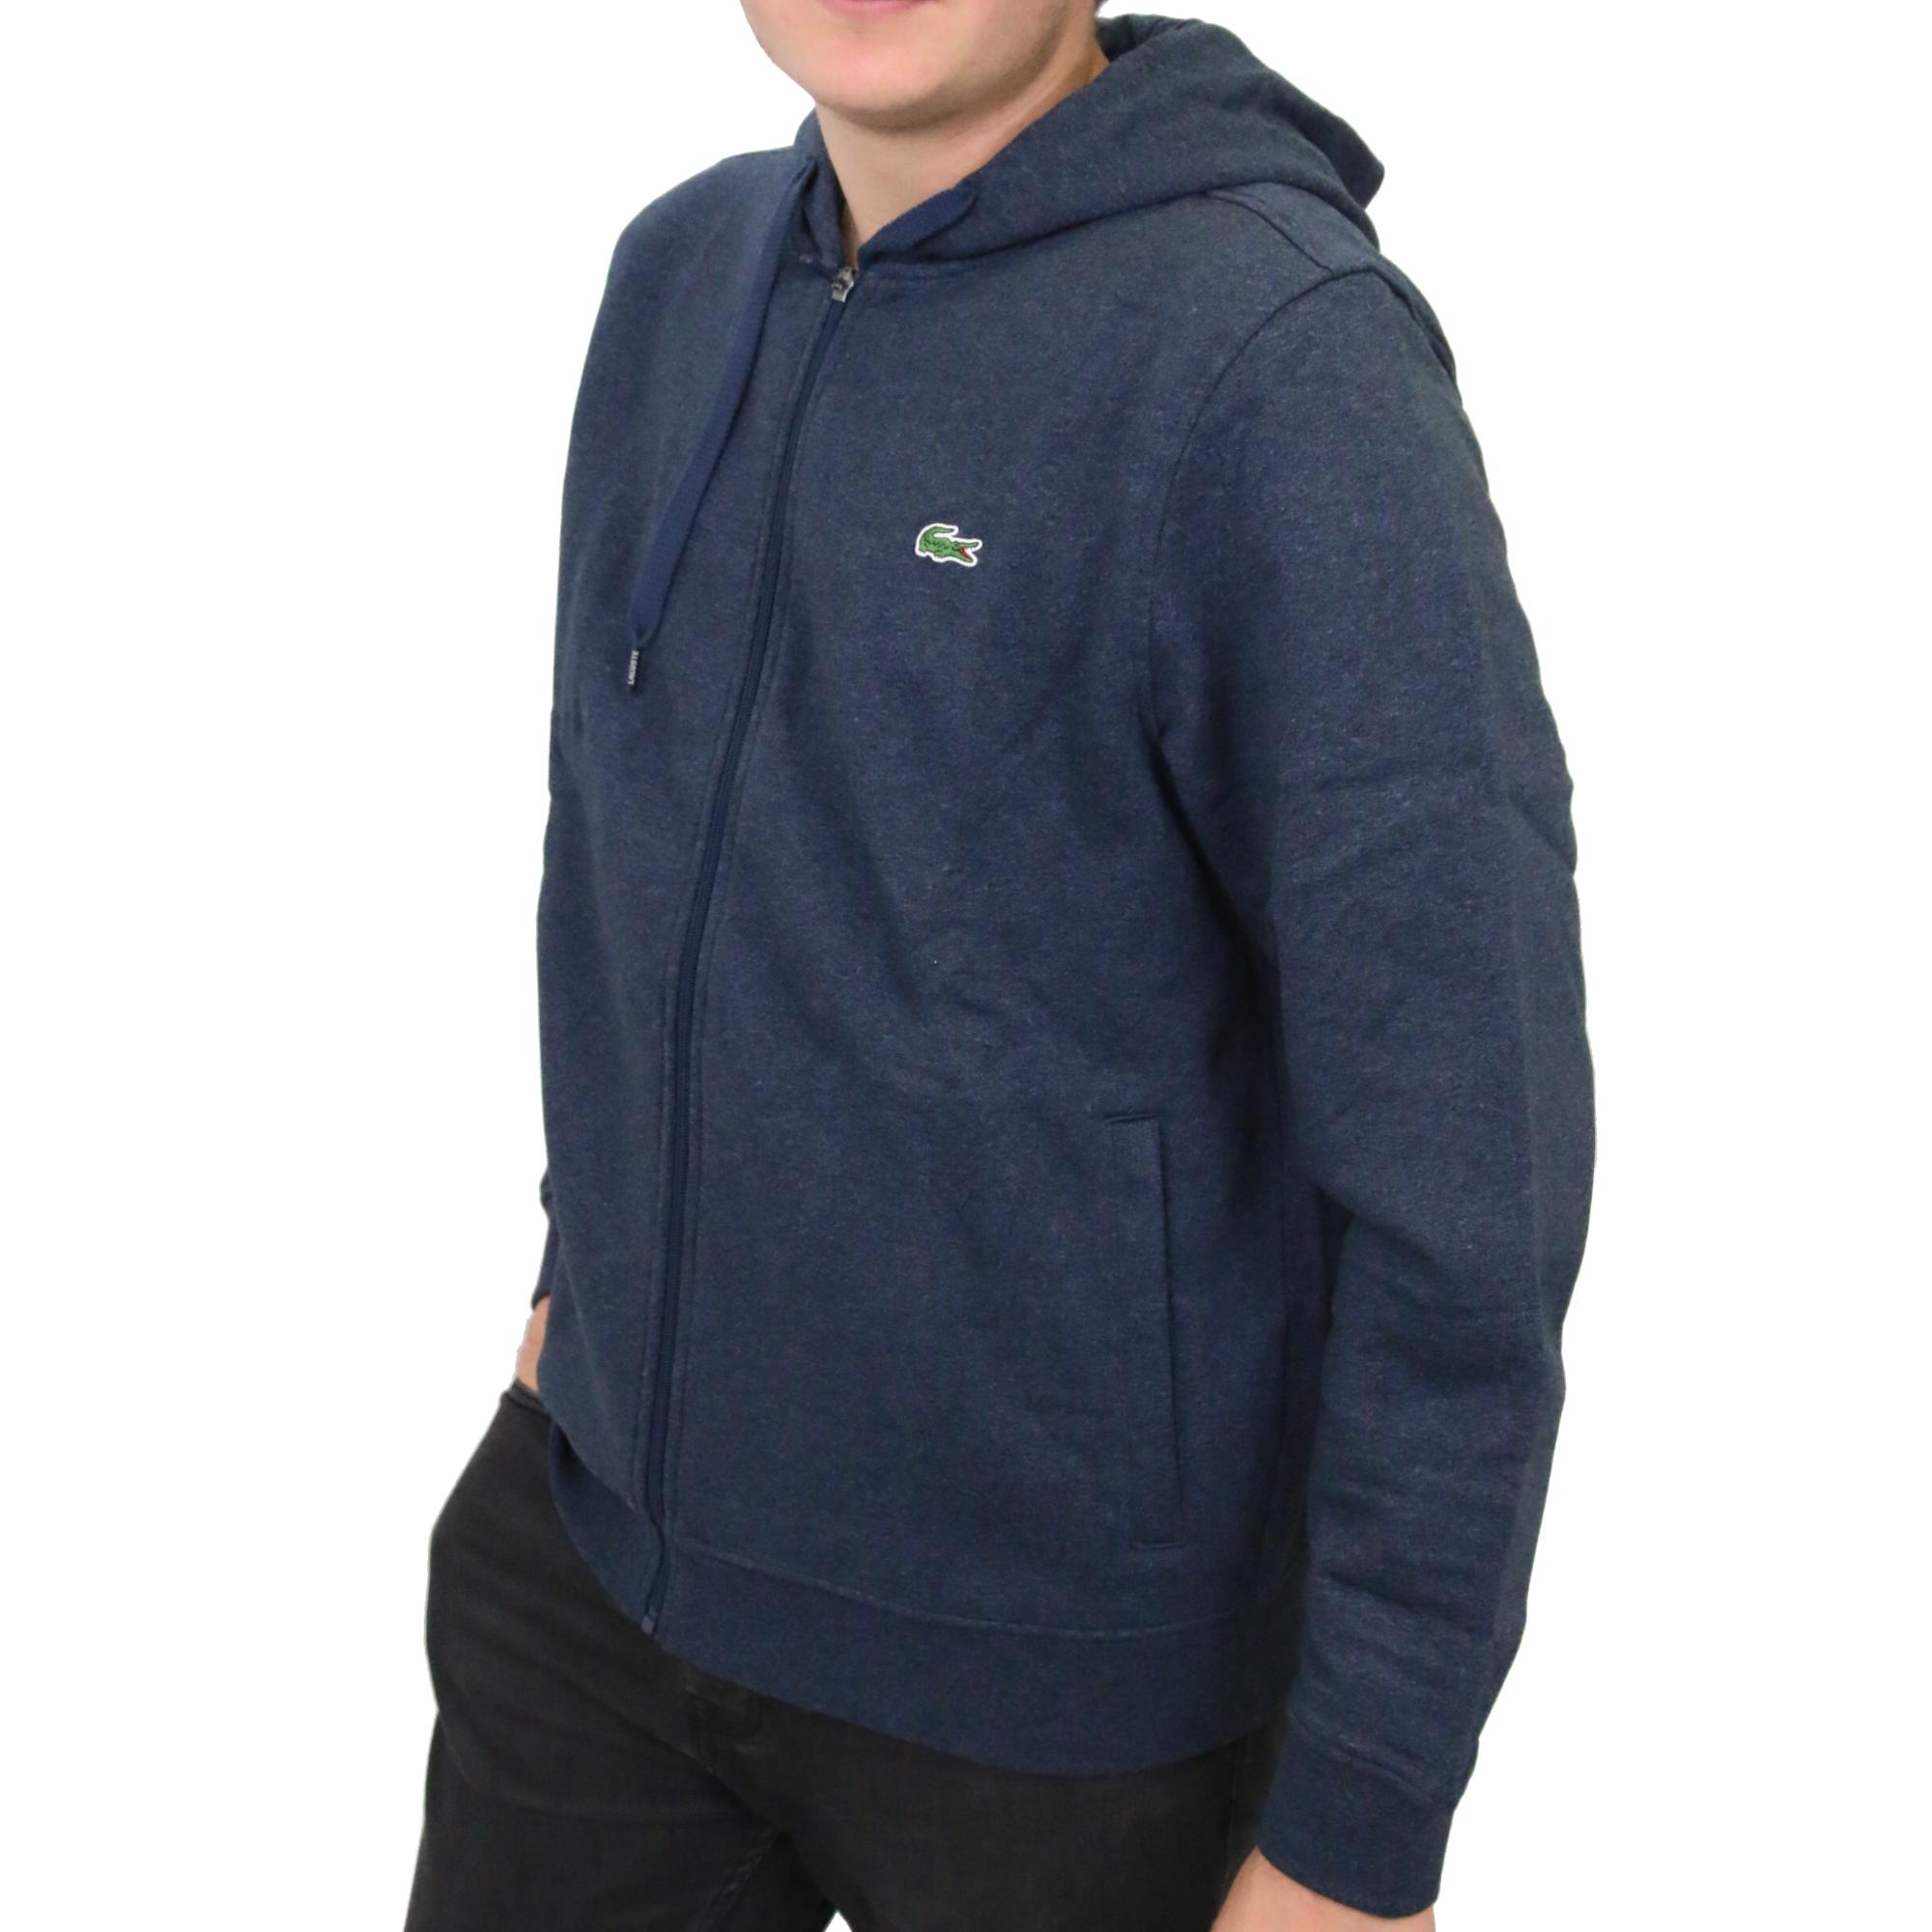 lacoste kapuzen sweatshirt jacke kapuzenjacke hoodie sweatshirtjacke herren ebay. Black Bedroom Furniture Sets. Home Design Ideas